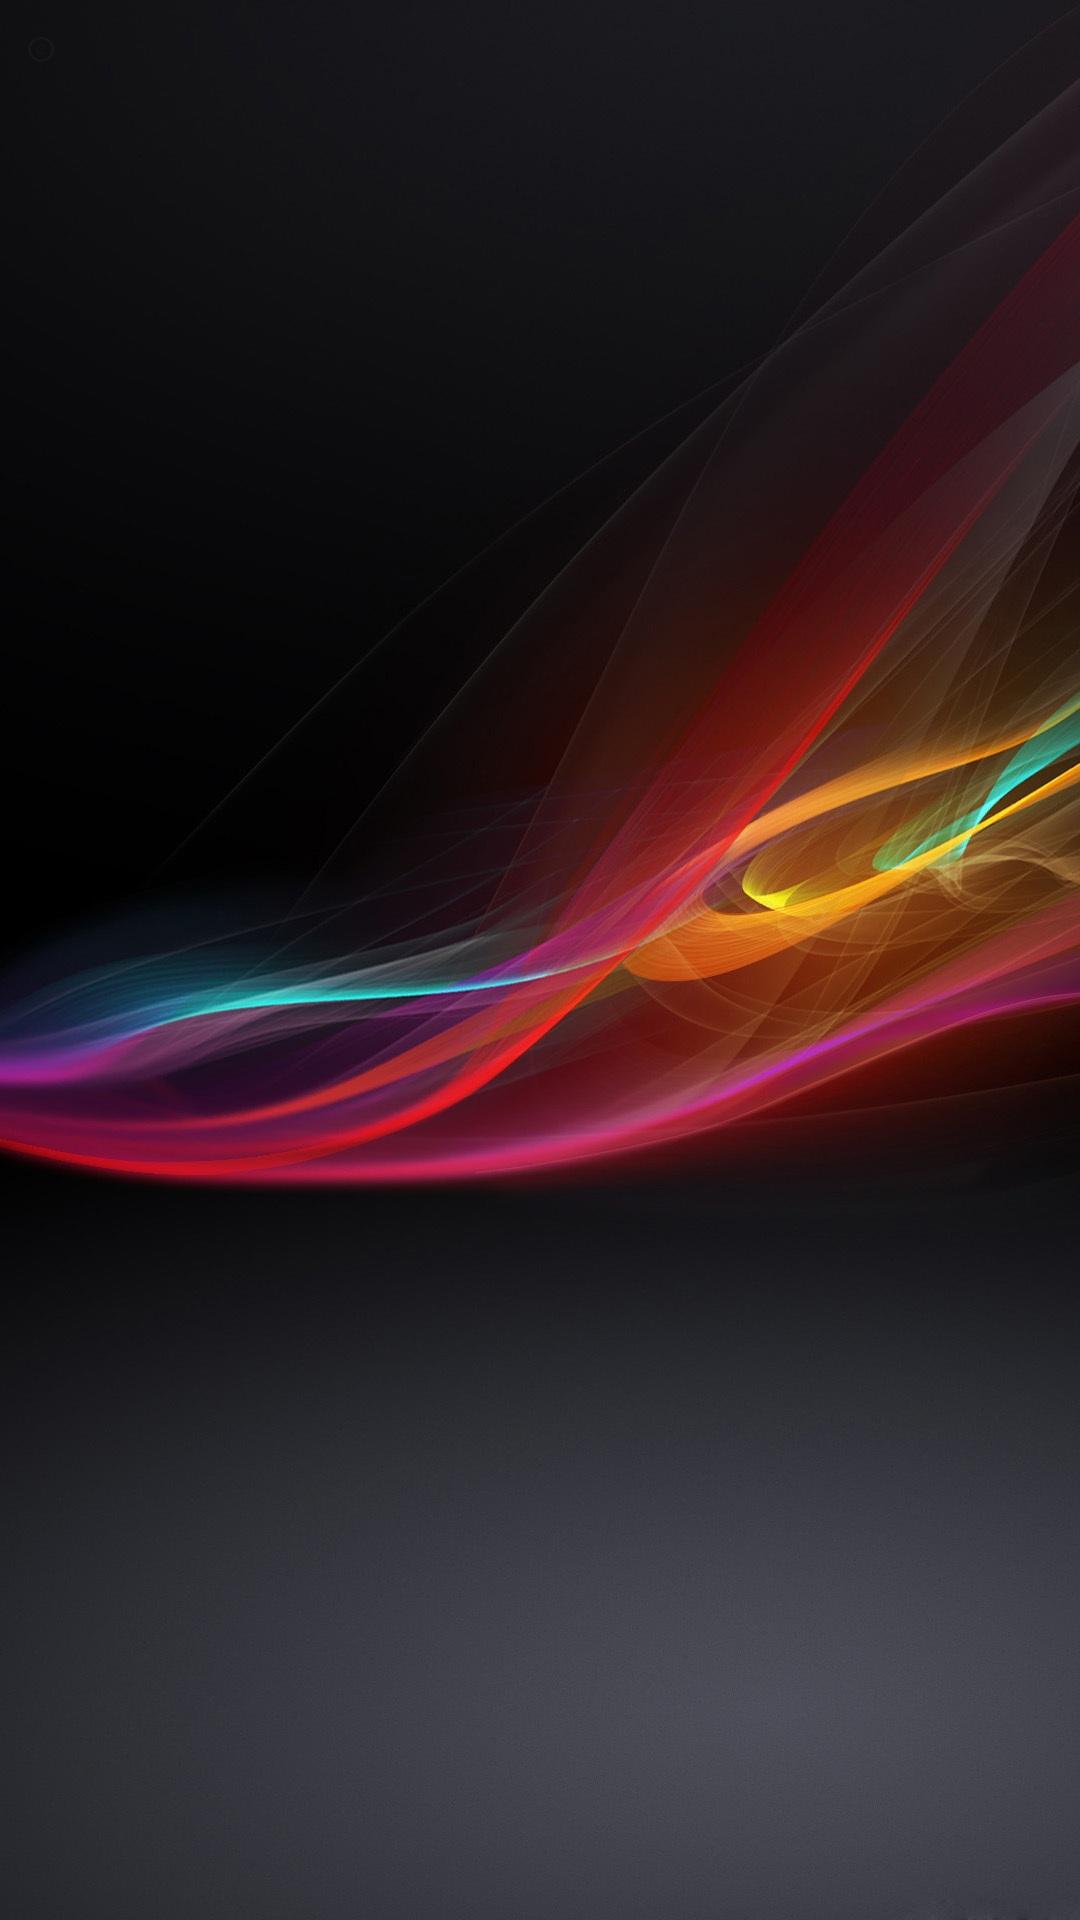 Nba Wallpaper Hd Free Hd Wallpapers For Phone Pixelstalk Net